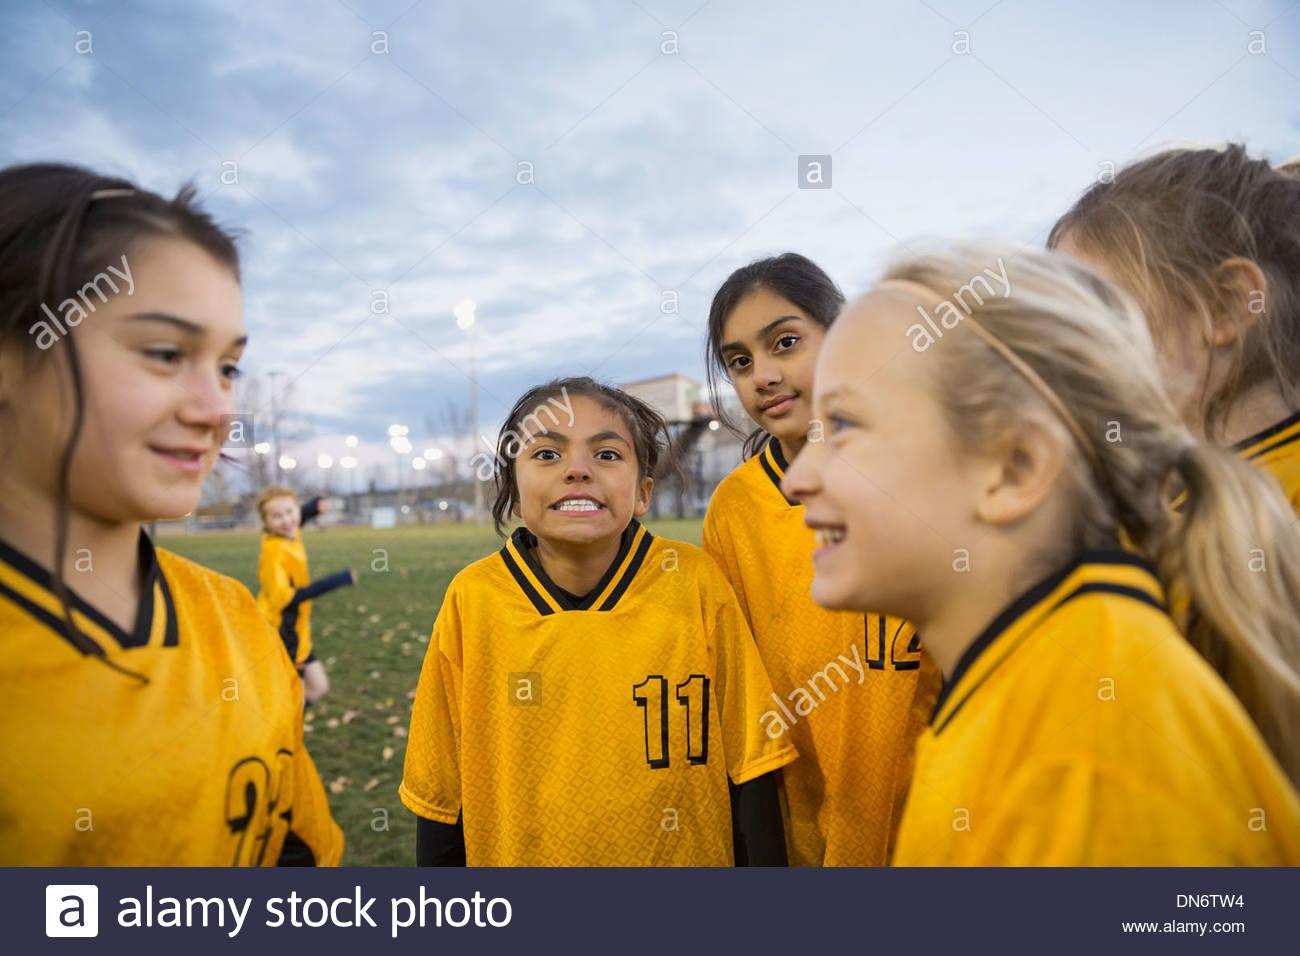 Soccer team on field at dusk - Stock Image